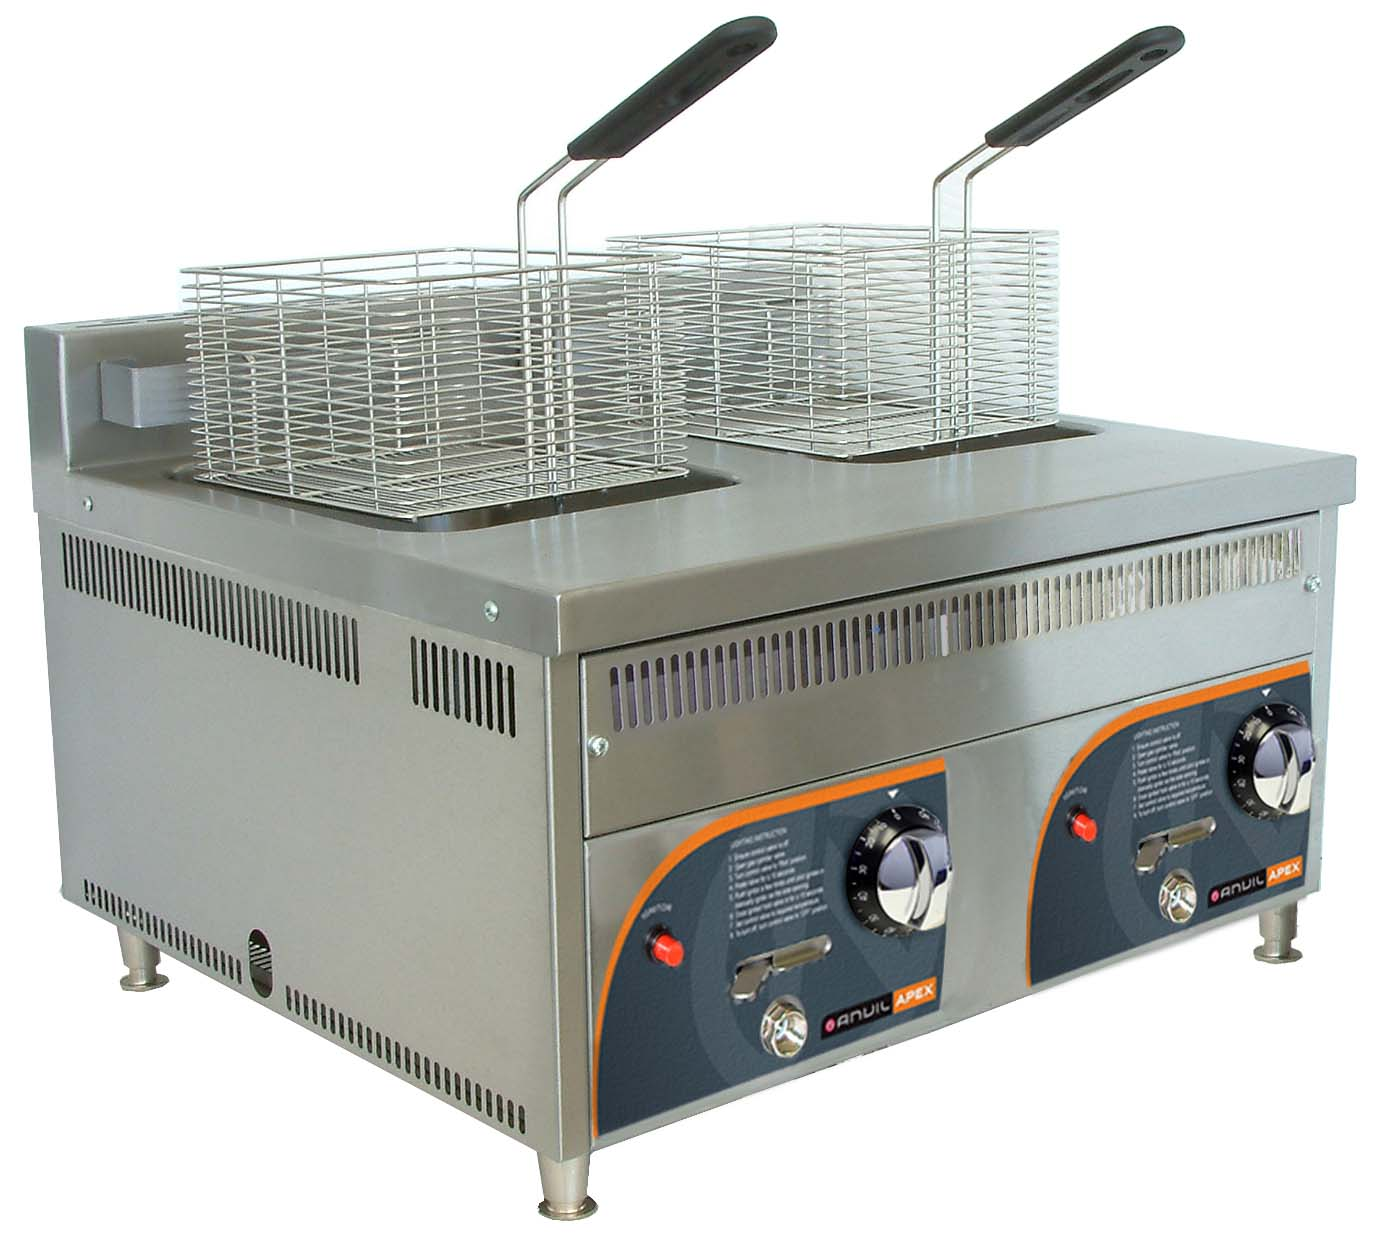 ffa4120--fish-fryer-anvil--double-pan--gas